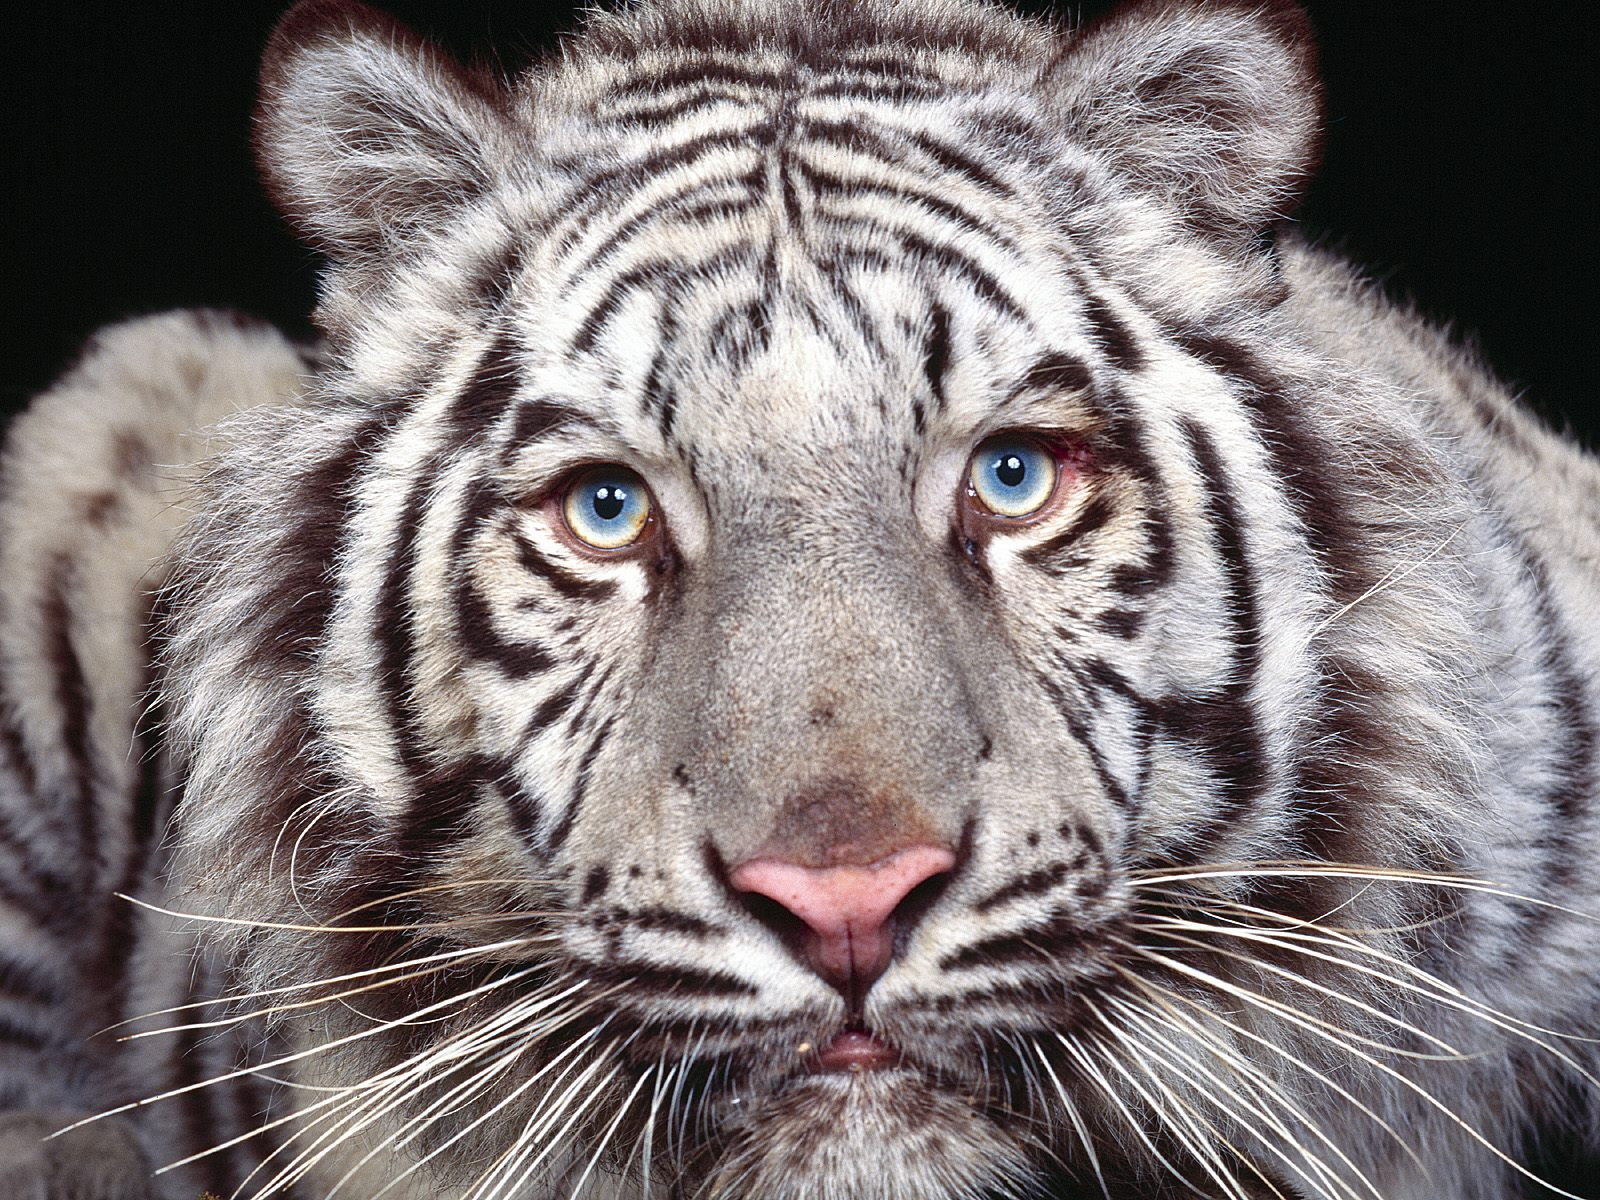 Baby siberian tiger wallpaper - photo#9